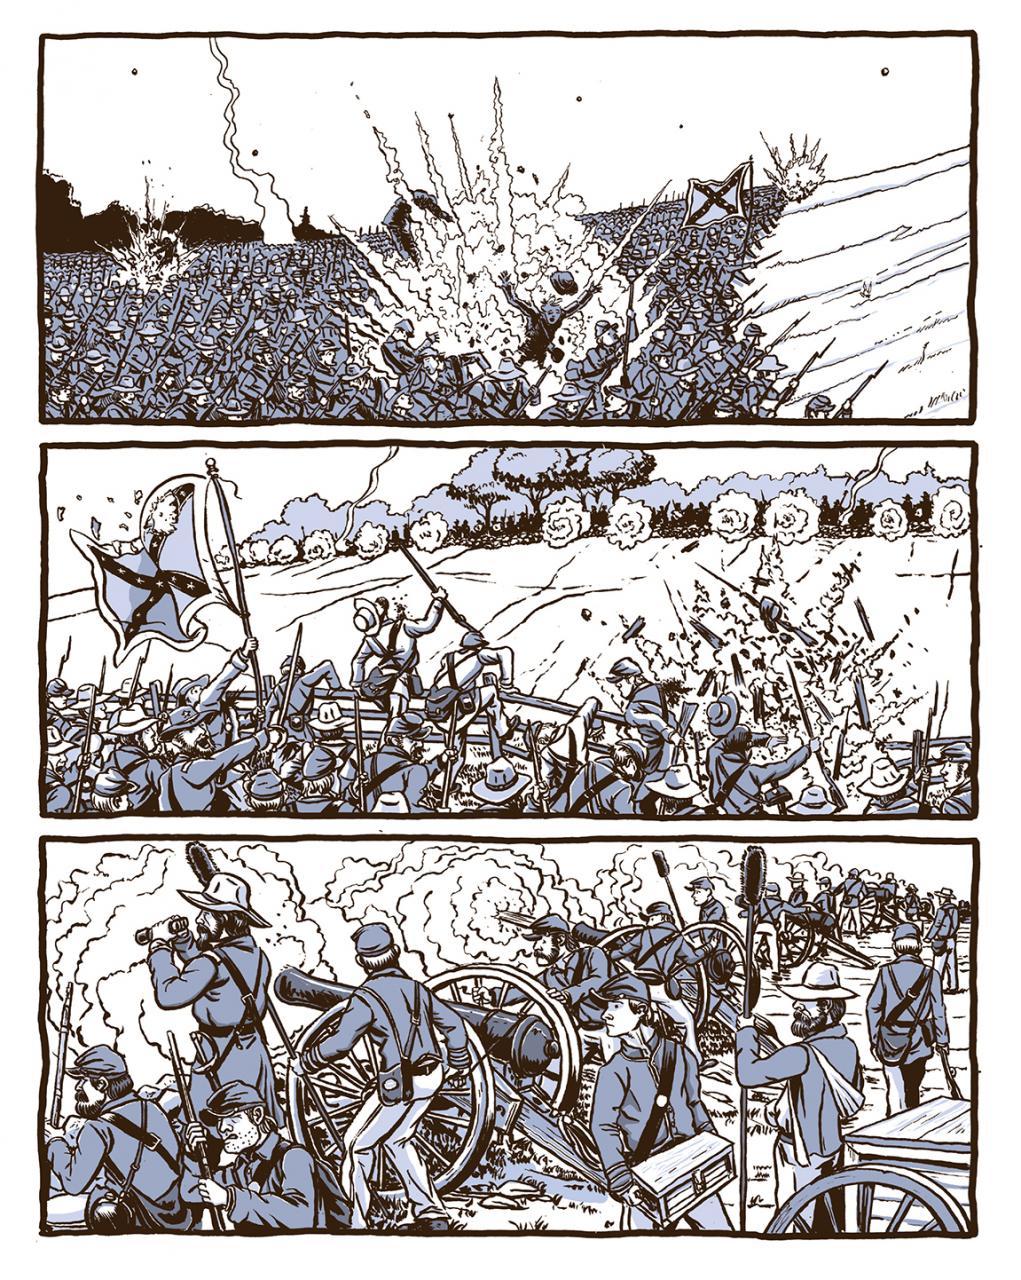 Gettysburg_Illustration_4